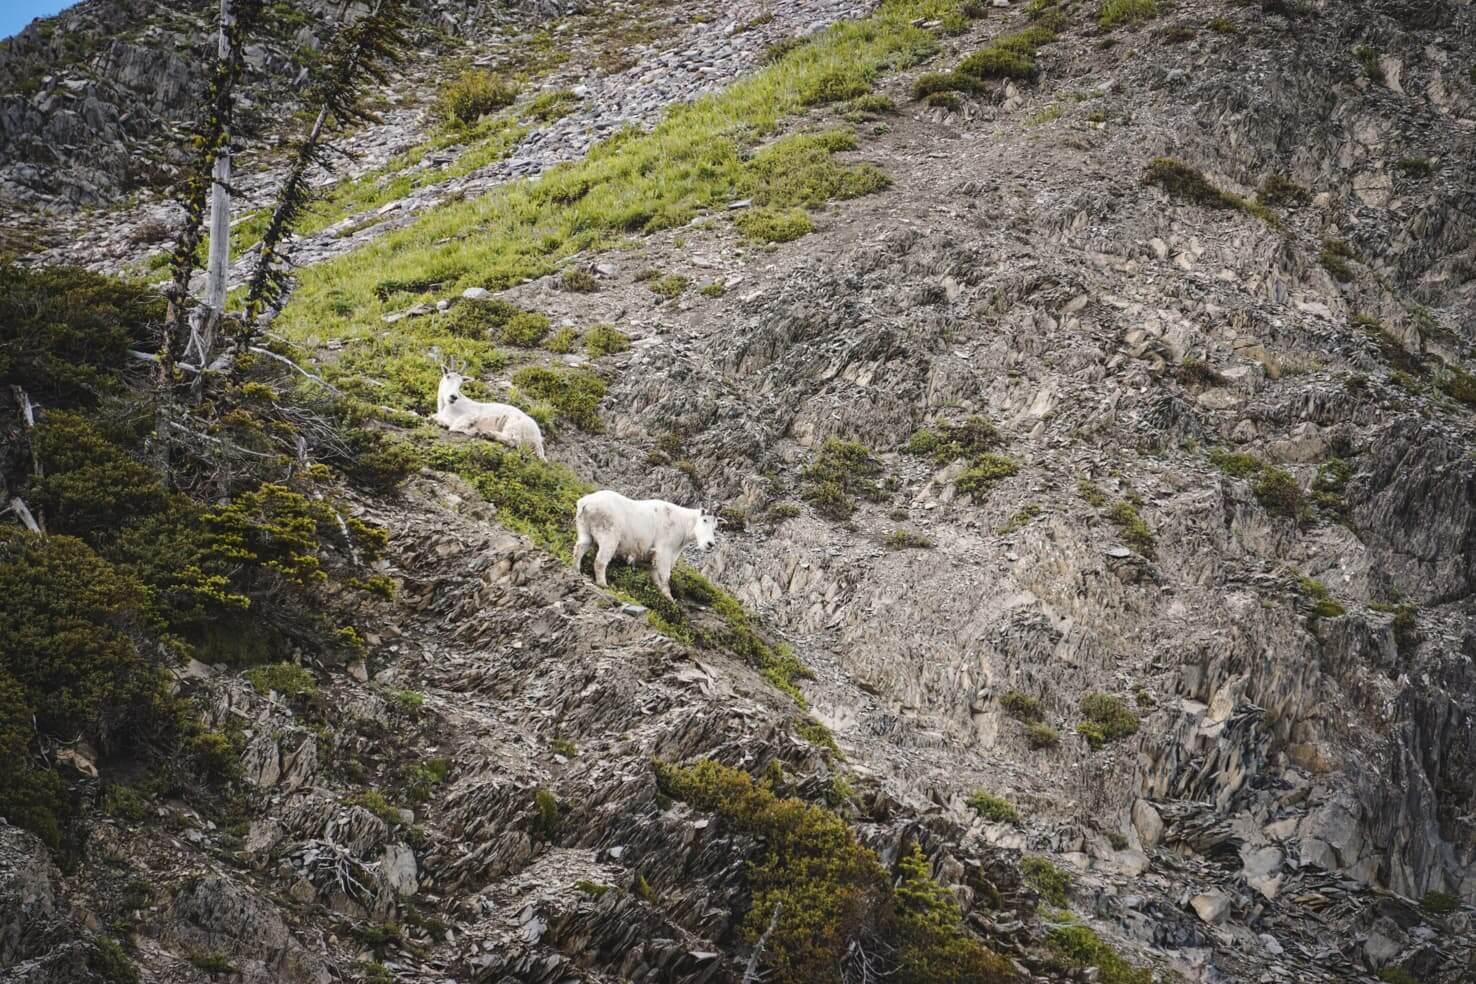 Canadian Rockies road trip itinerary - Fernie